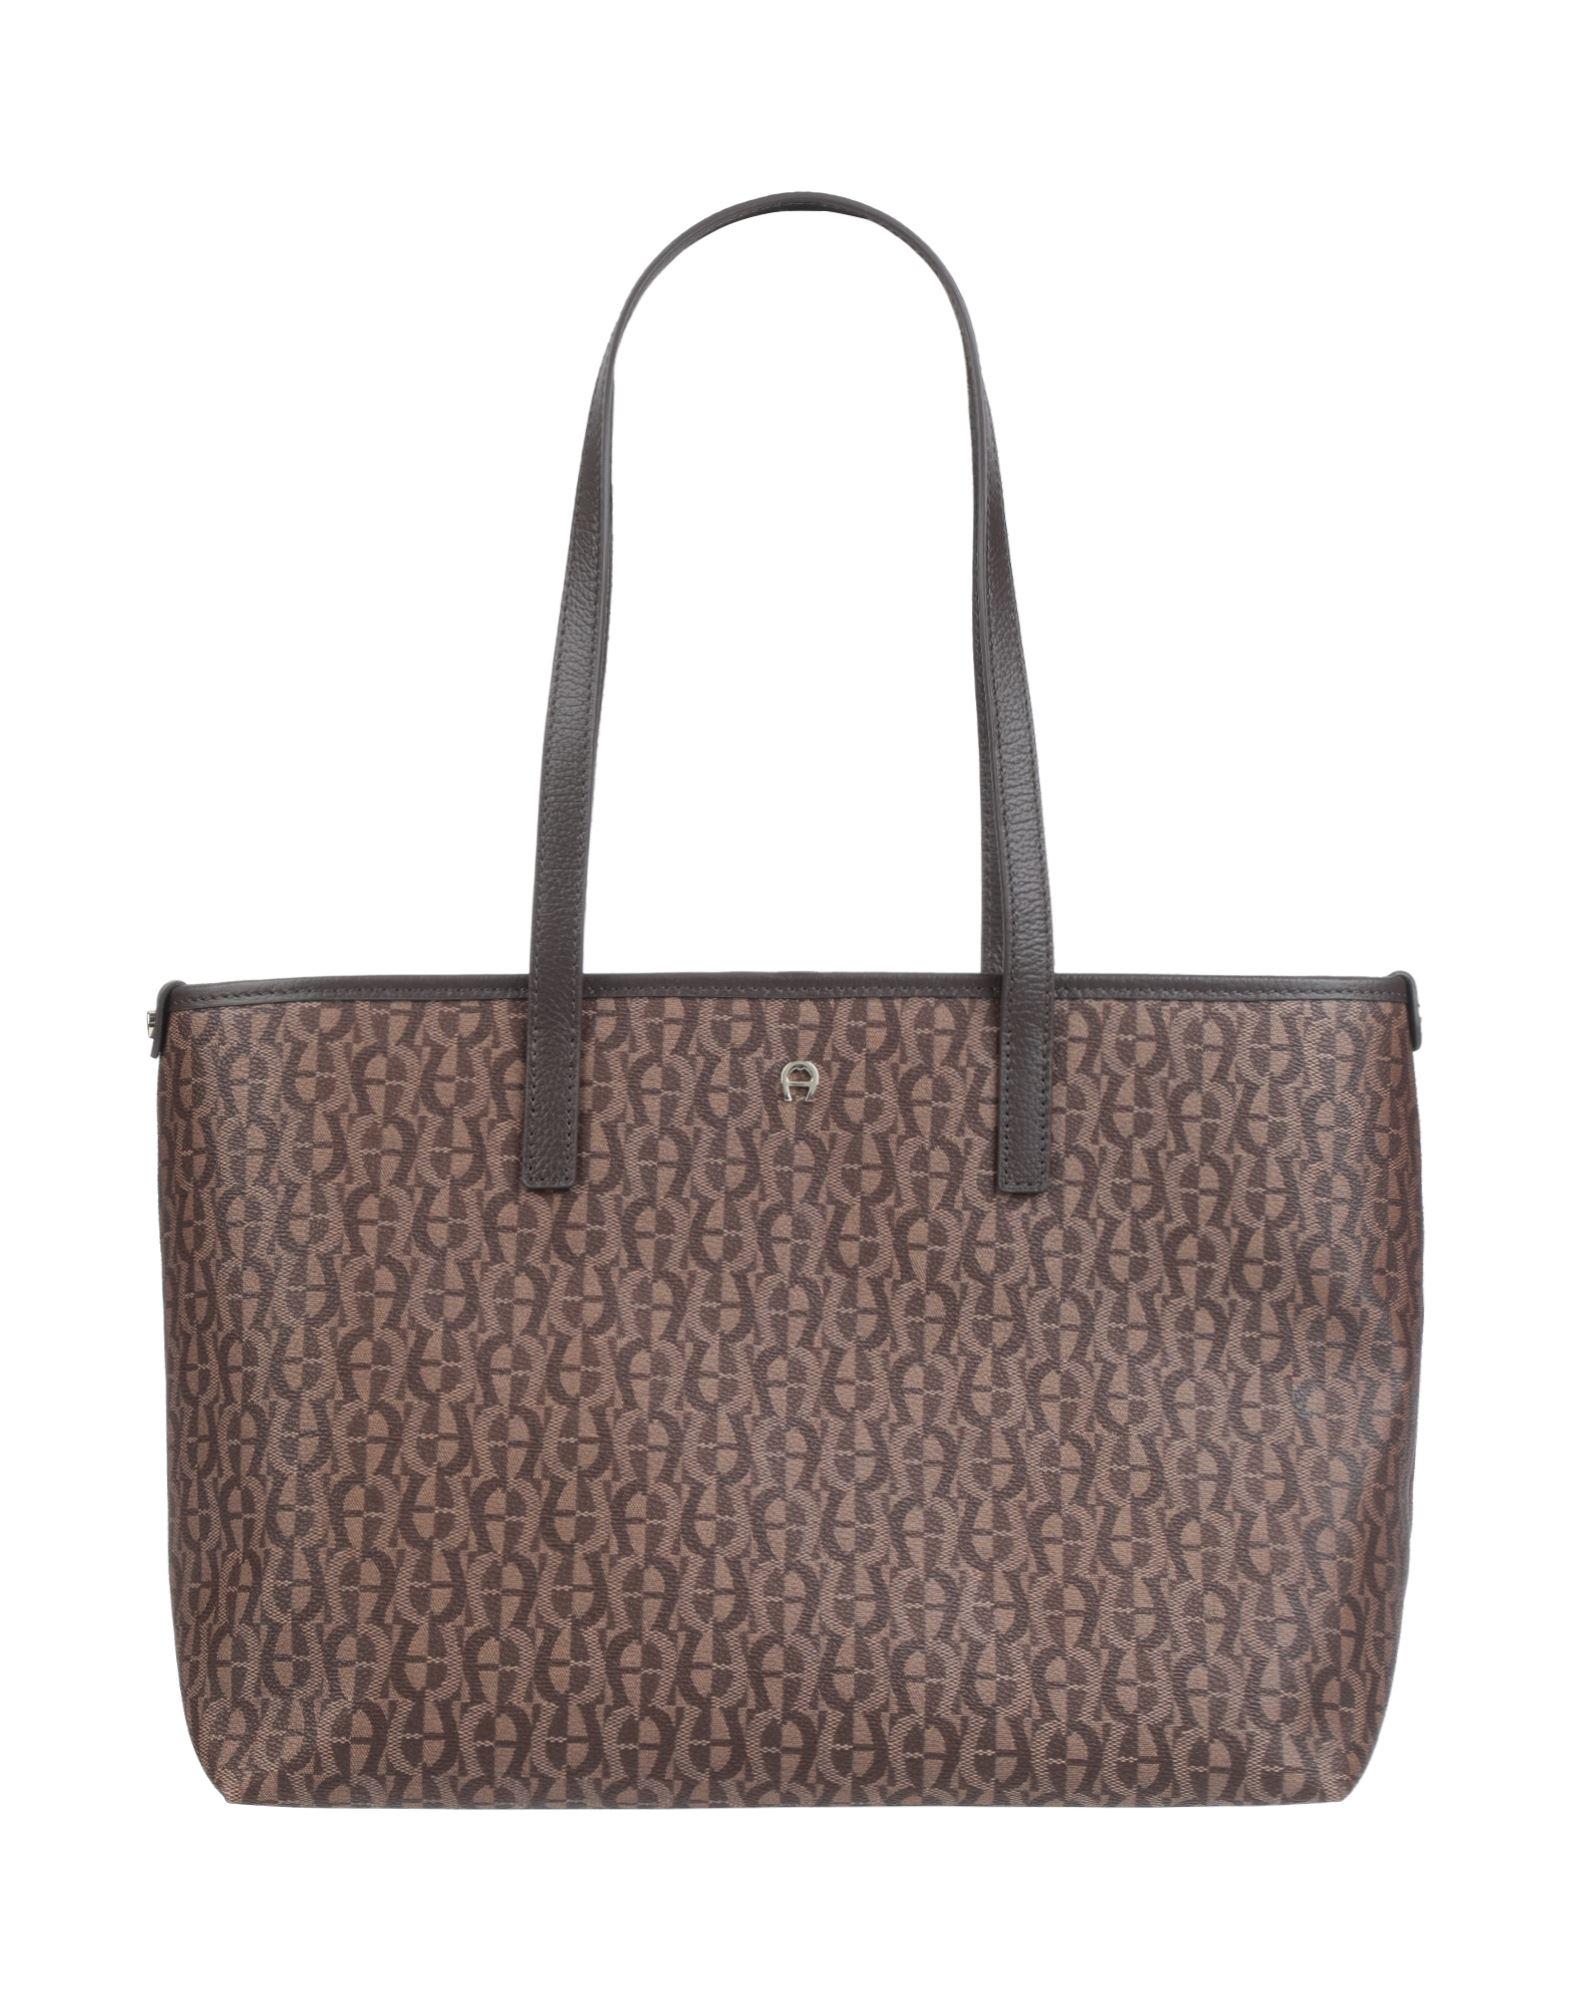 AIGNER Shoulder bags - Item 45560815